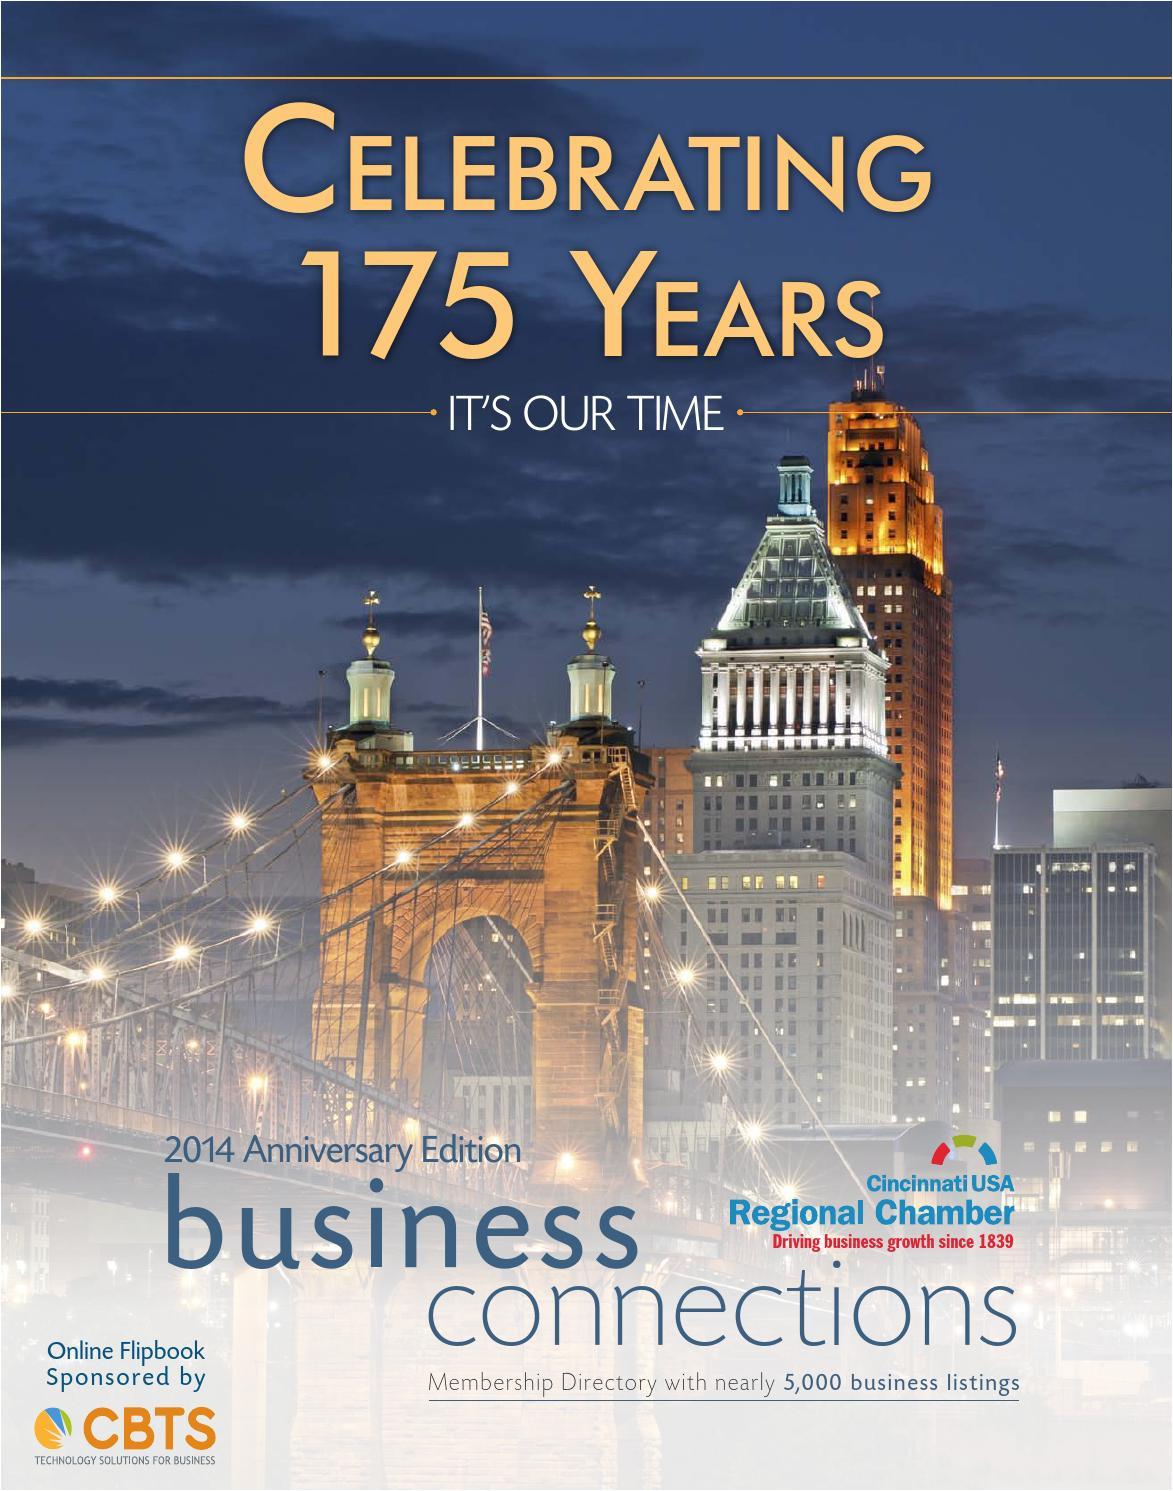 Queen City Garage Door Repair Springfield Mo Cincinnati Usa Regional Chamber 175th Anniversary Publication by